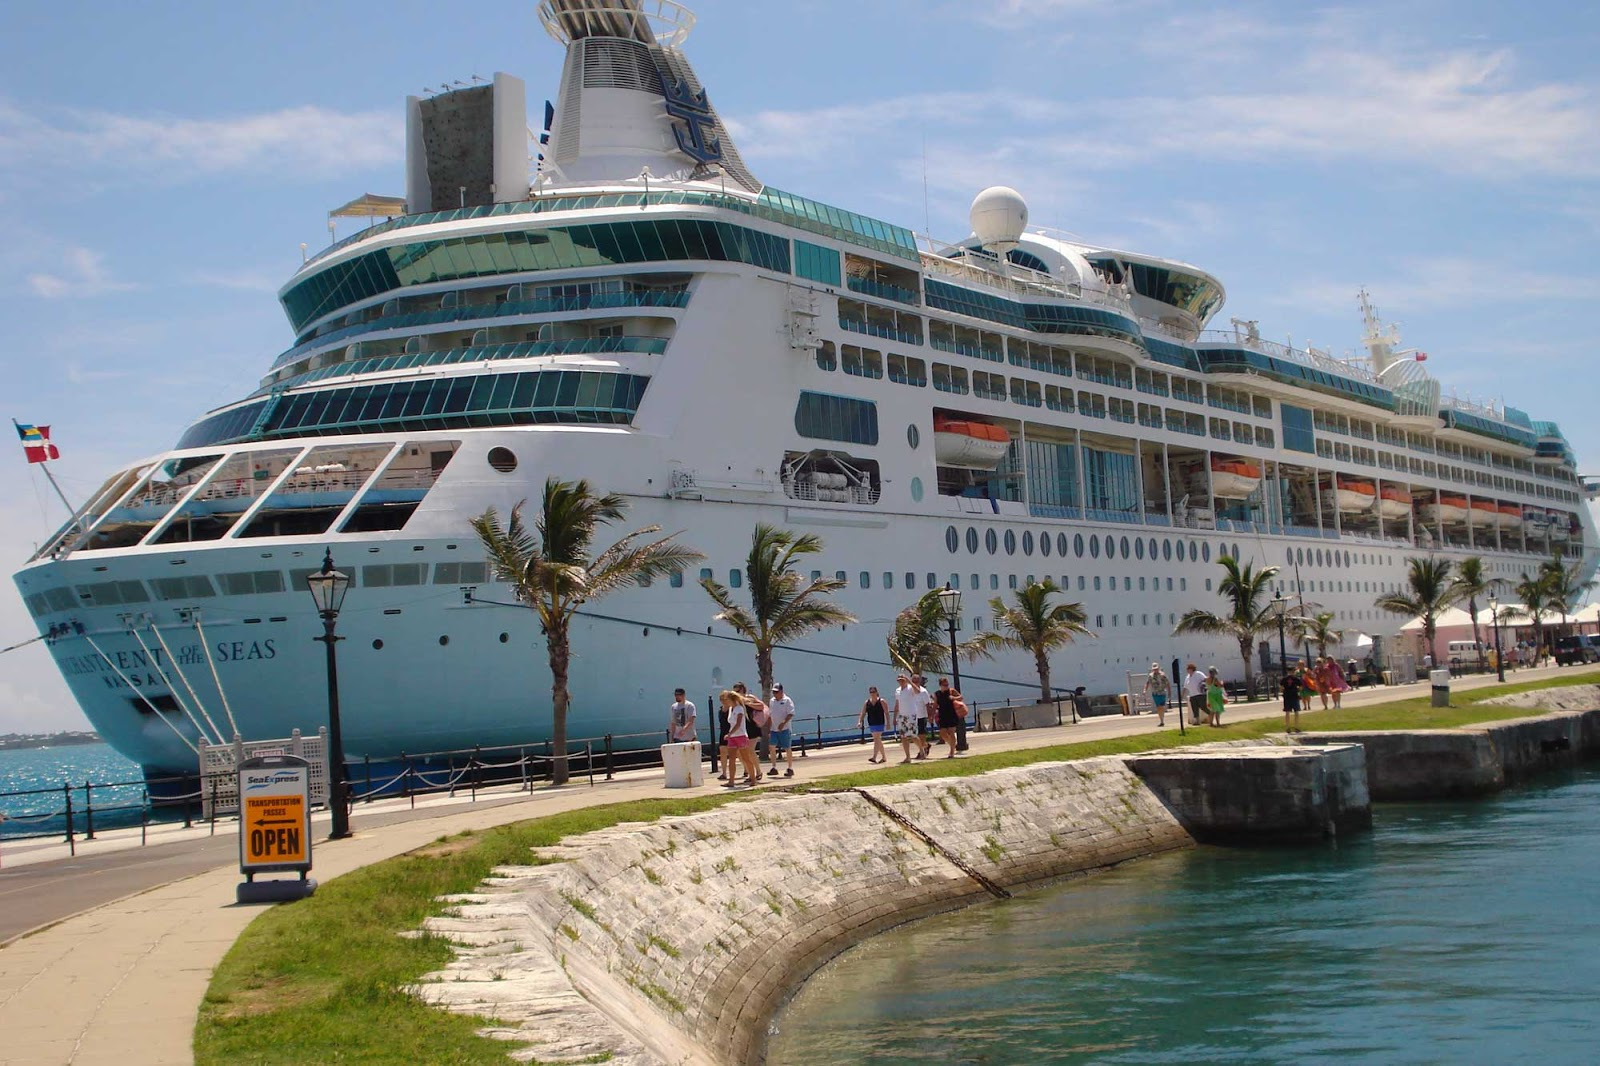 Bermuda Link - Observe